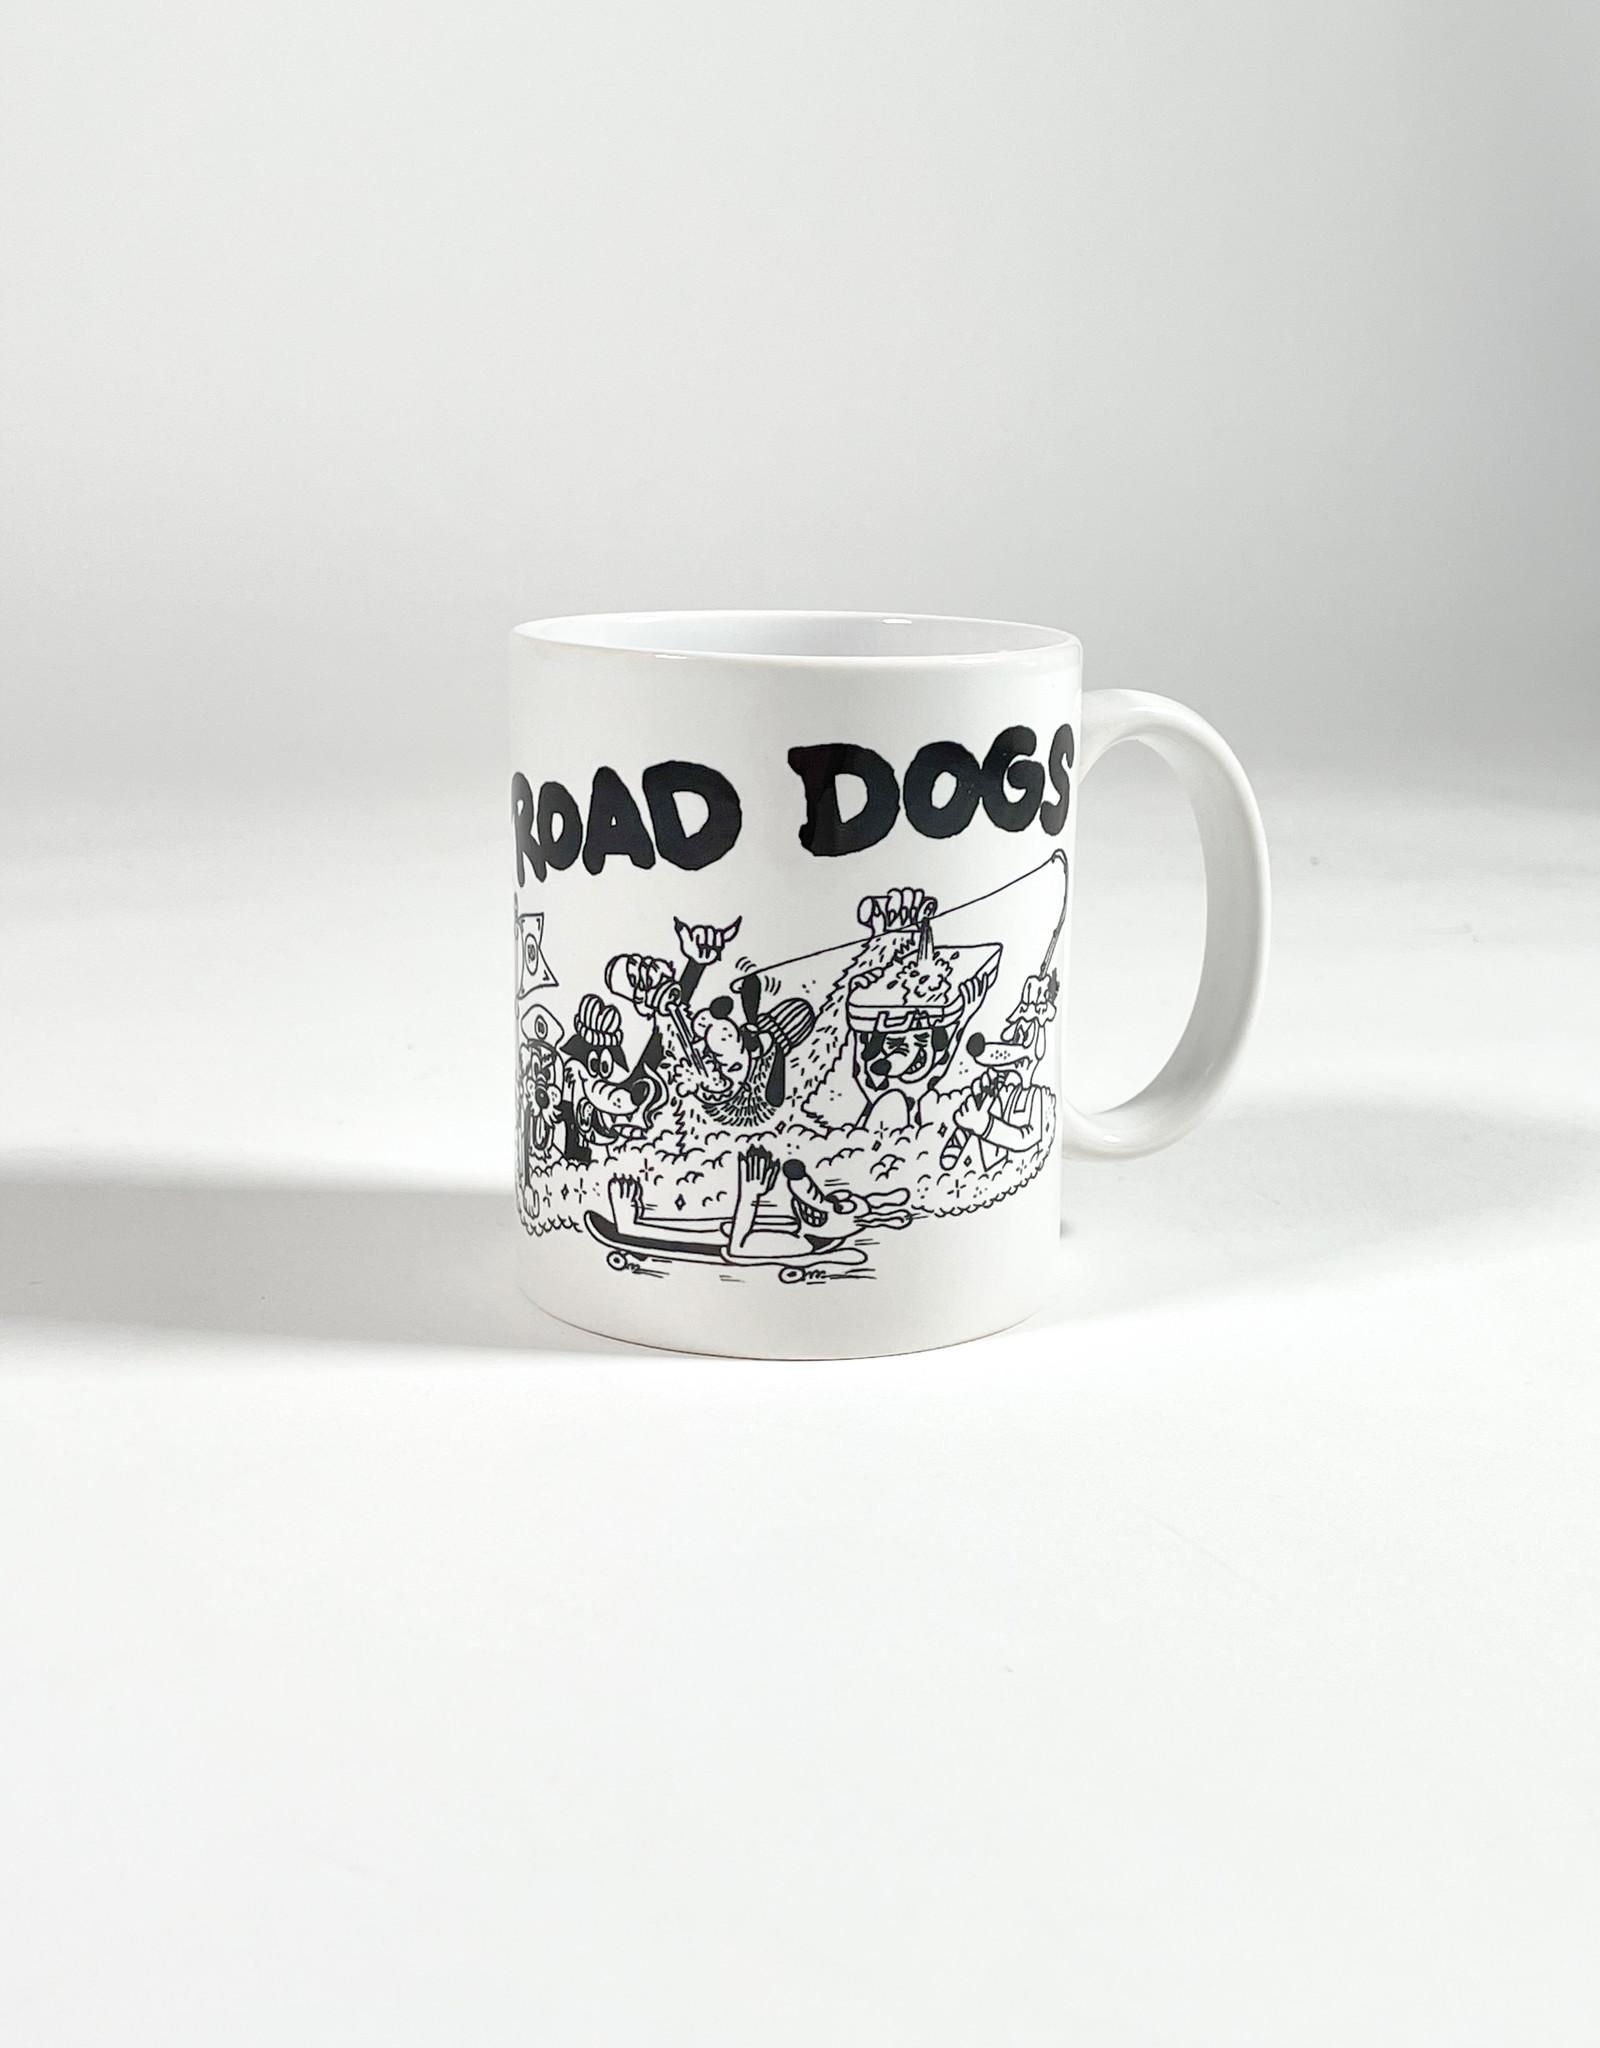 THE ROAD IS LIFE ROAD DOGS COFFEE MUG